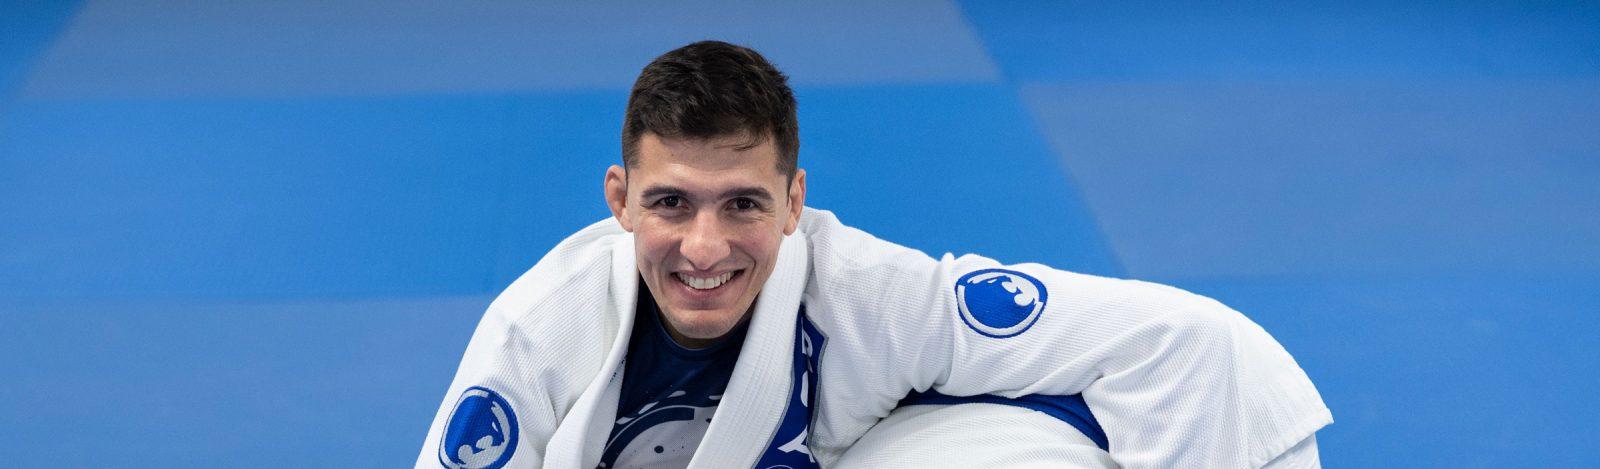 Renzo Gracie Chicago Brazilian Jiu Jitsu